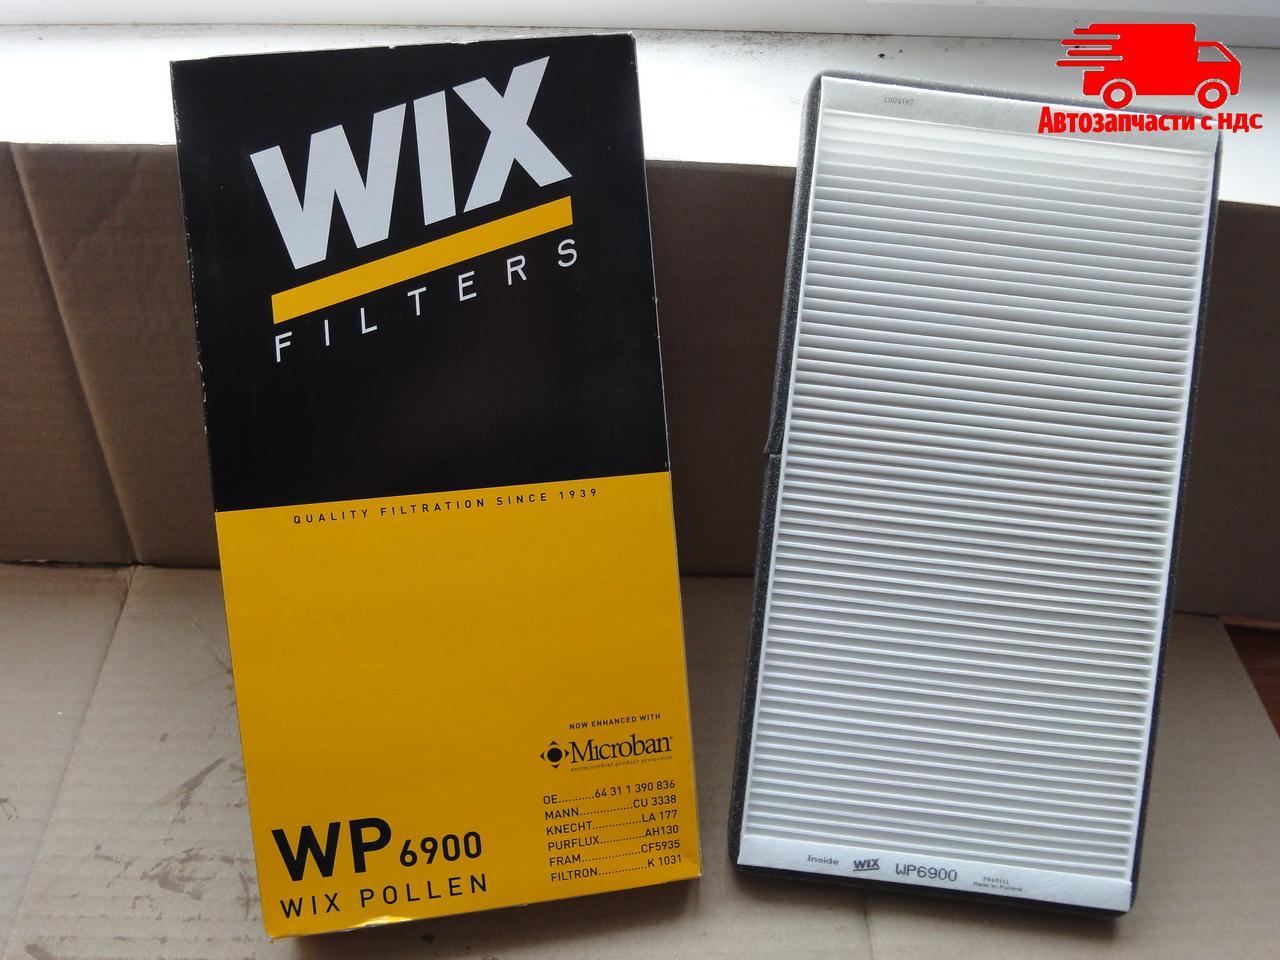 Фильтр салона BMW E34 WP6900/K1031, BMW 5, BMW 7 (WIX-Filtron) WP6900